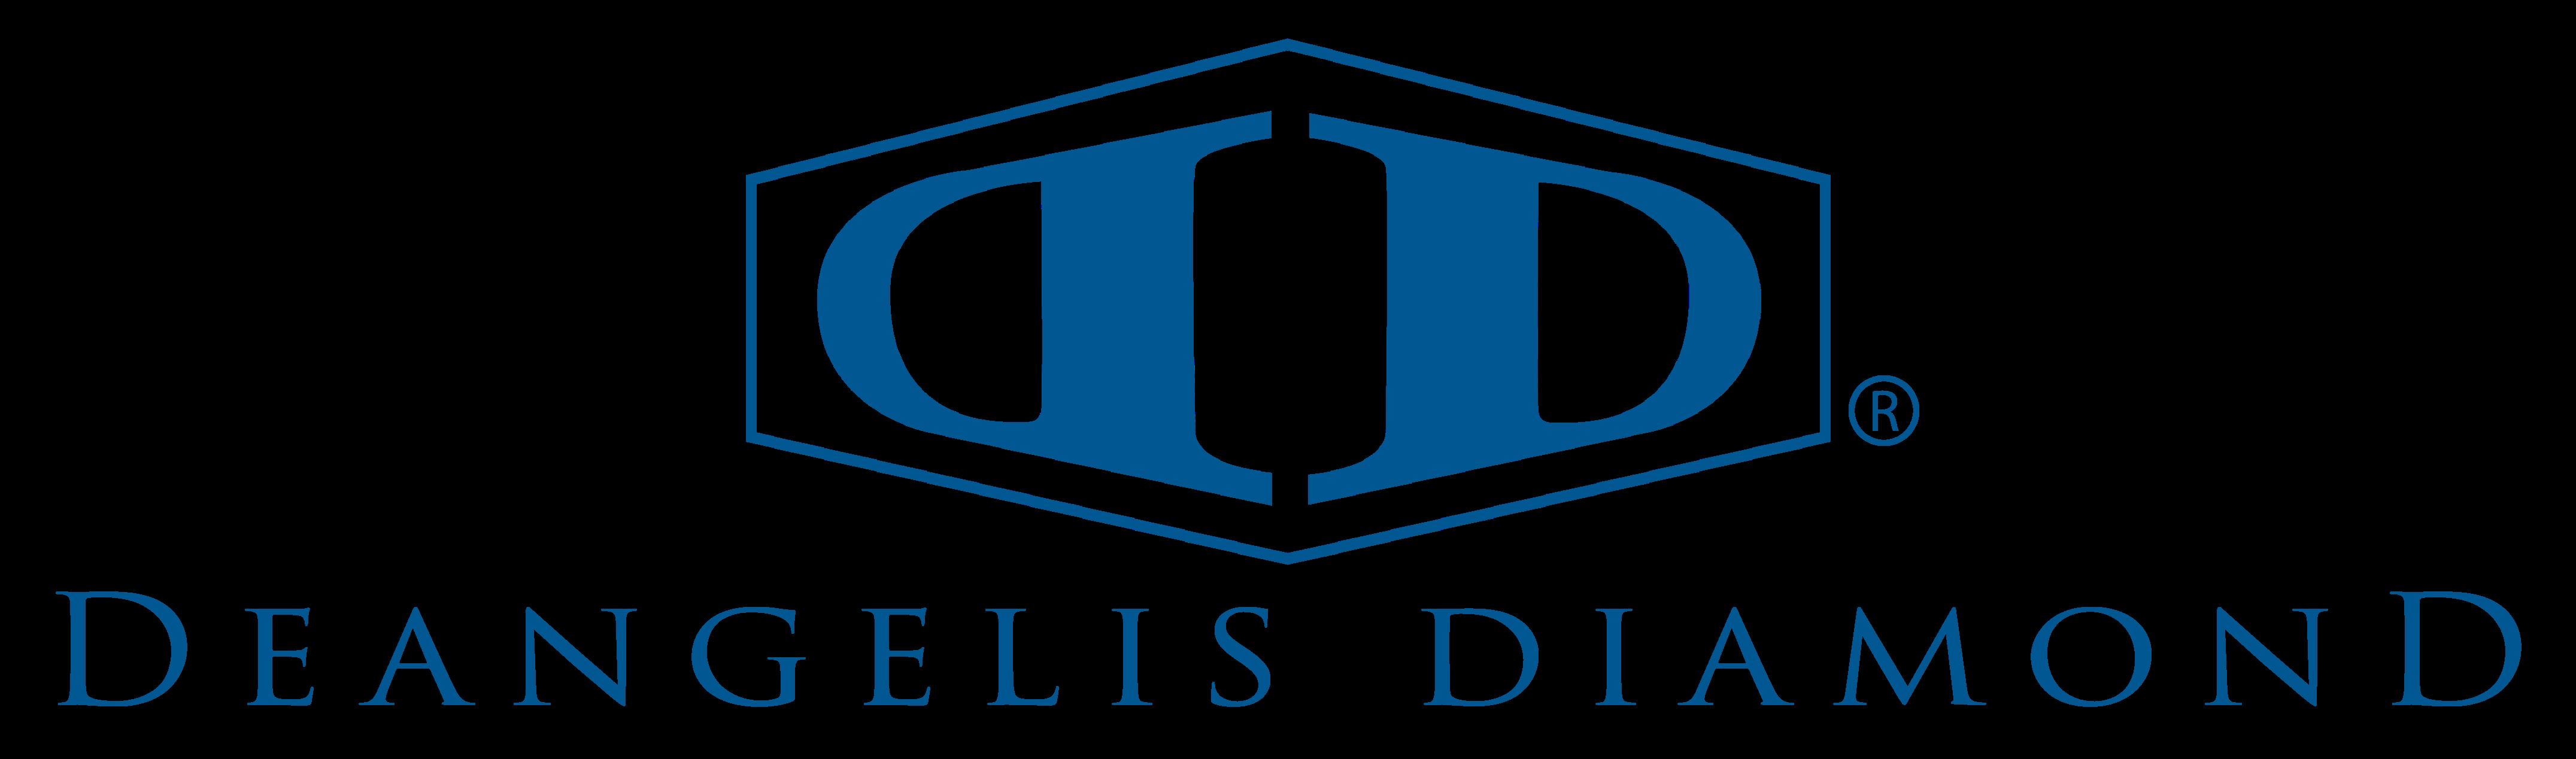 deangelis diamond job board